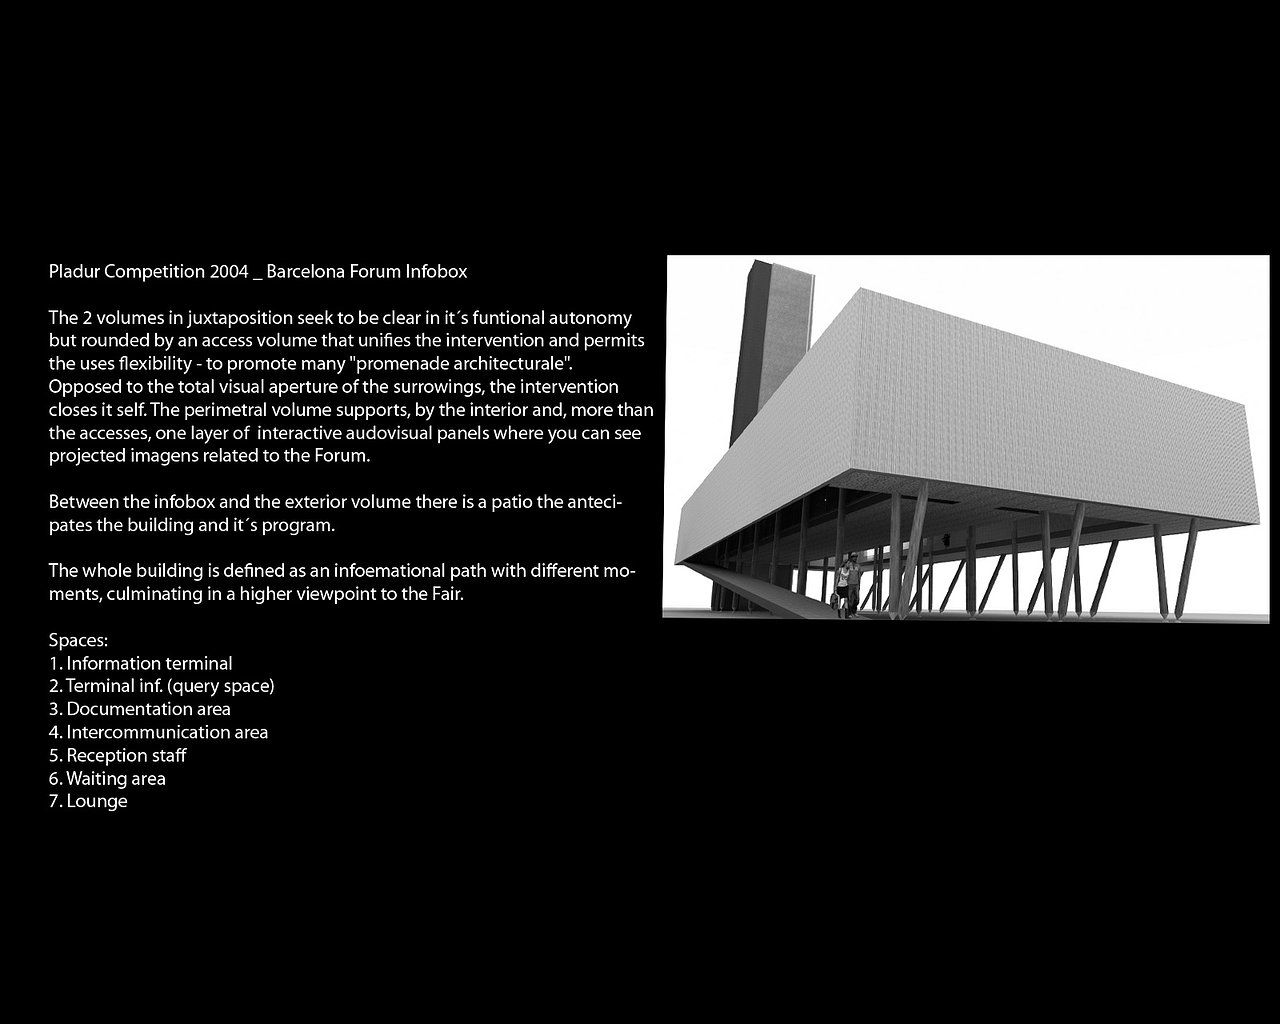 Ficha de projecto - Pladur.jpg